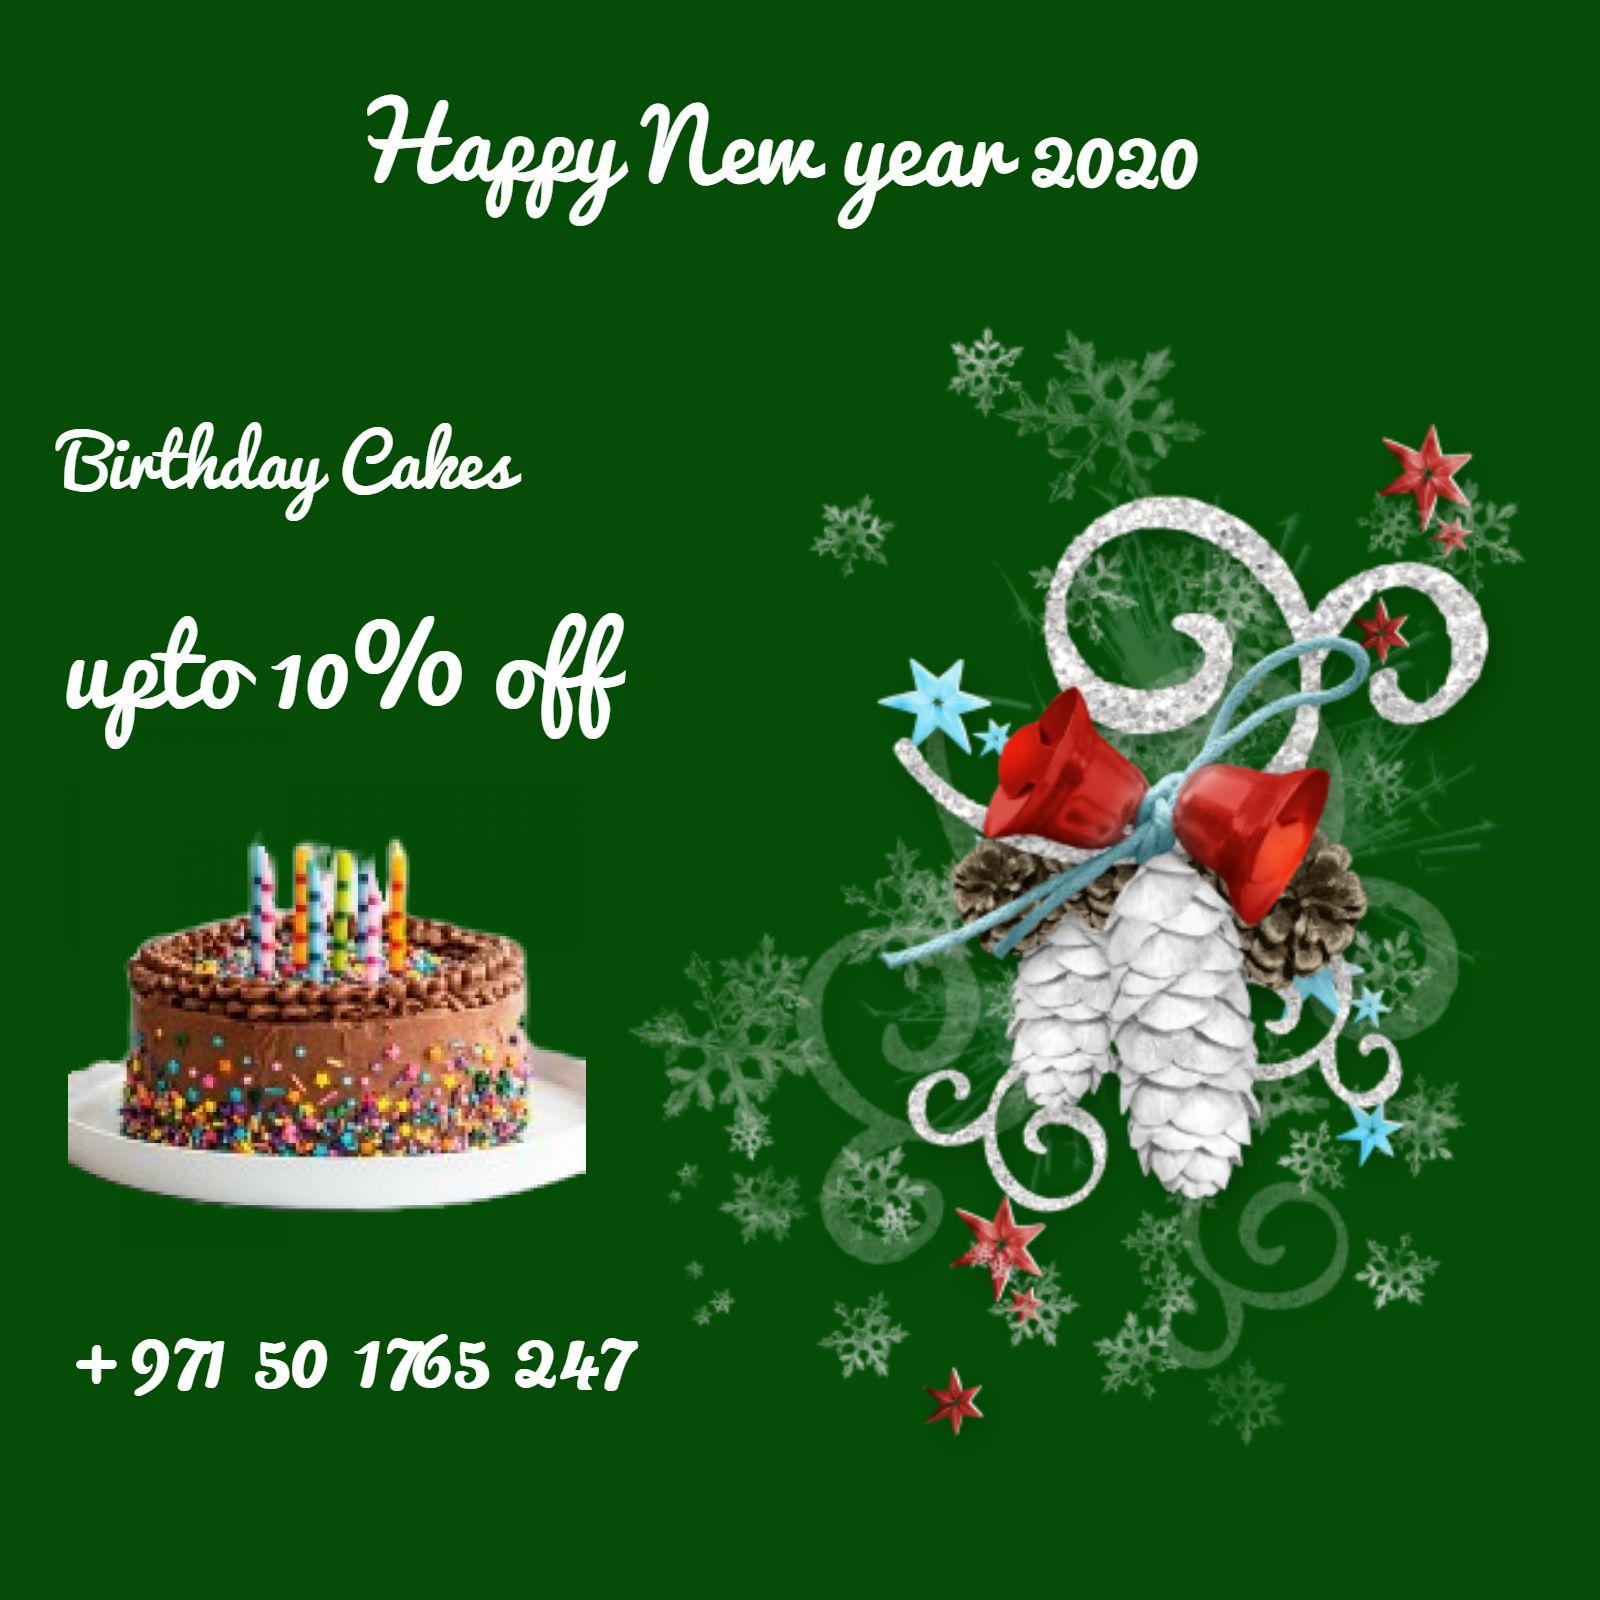 Online Birthday Cake Delivery In Dubai Gdo Gifts In 2020 Online Birthday Cake Order Birthday Cake Gifts Dubai